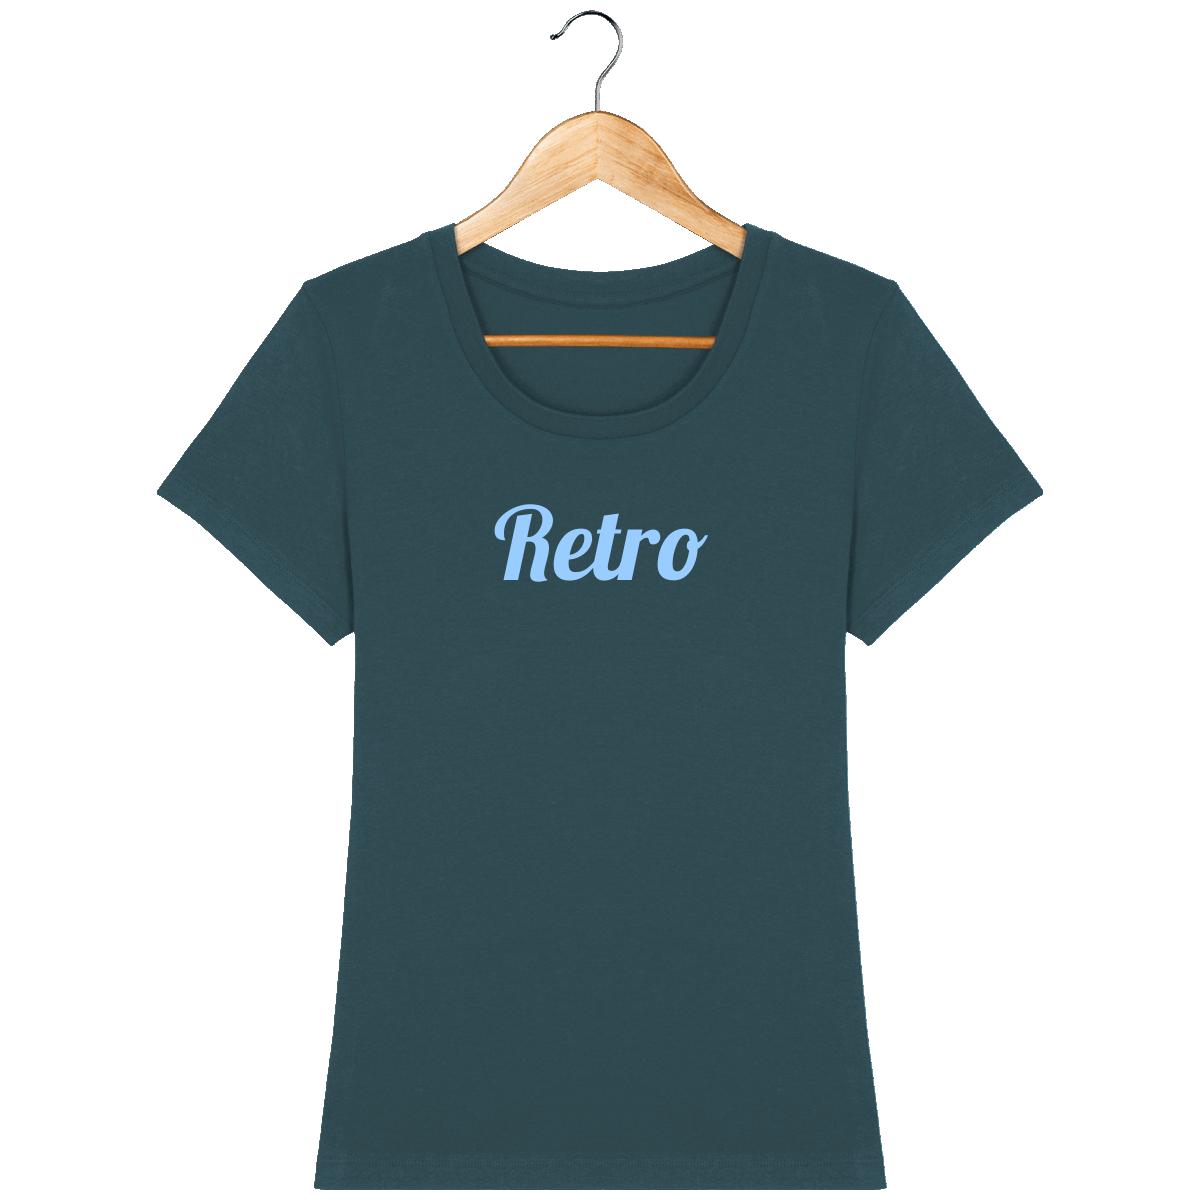 tshirt-bio-retro-heatherblackdenim-paleblue_stargazer_face